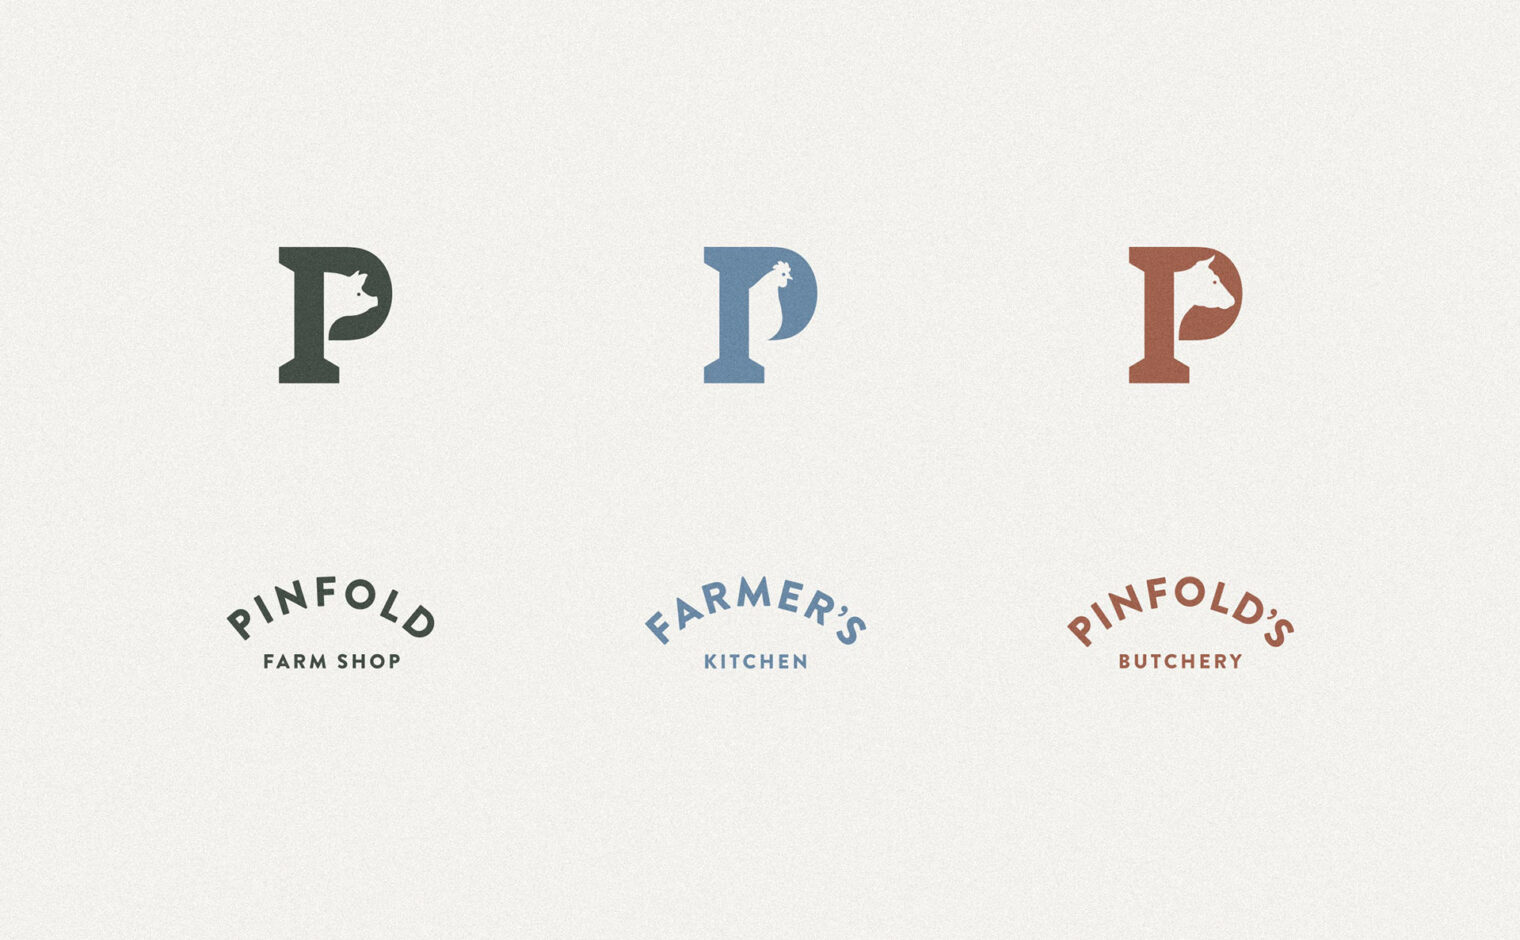 Pinfold Farm Shop - Logo variations for Farm Shop, Farmer's Kitchen and Butchery